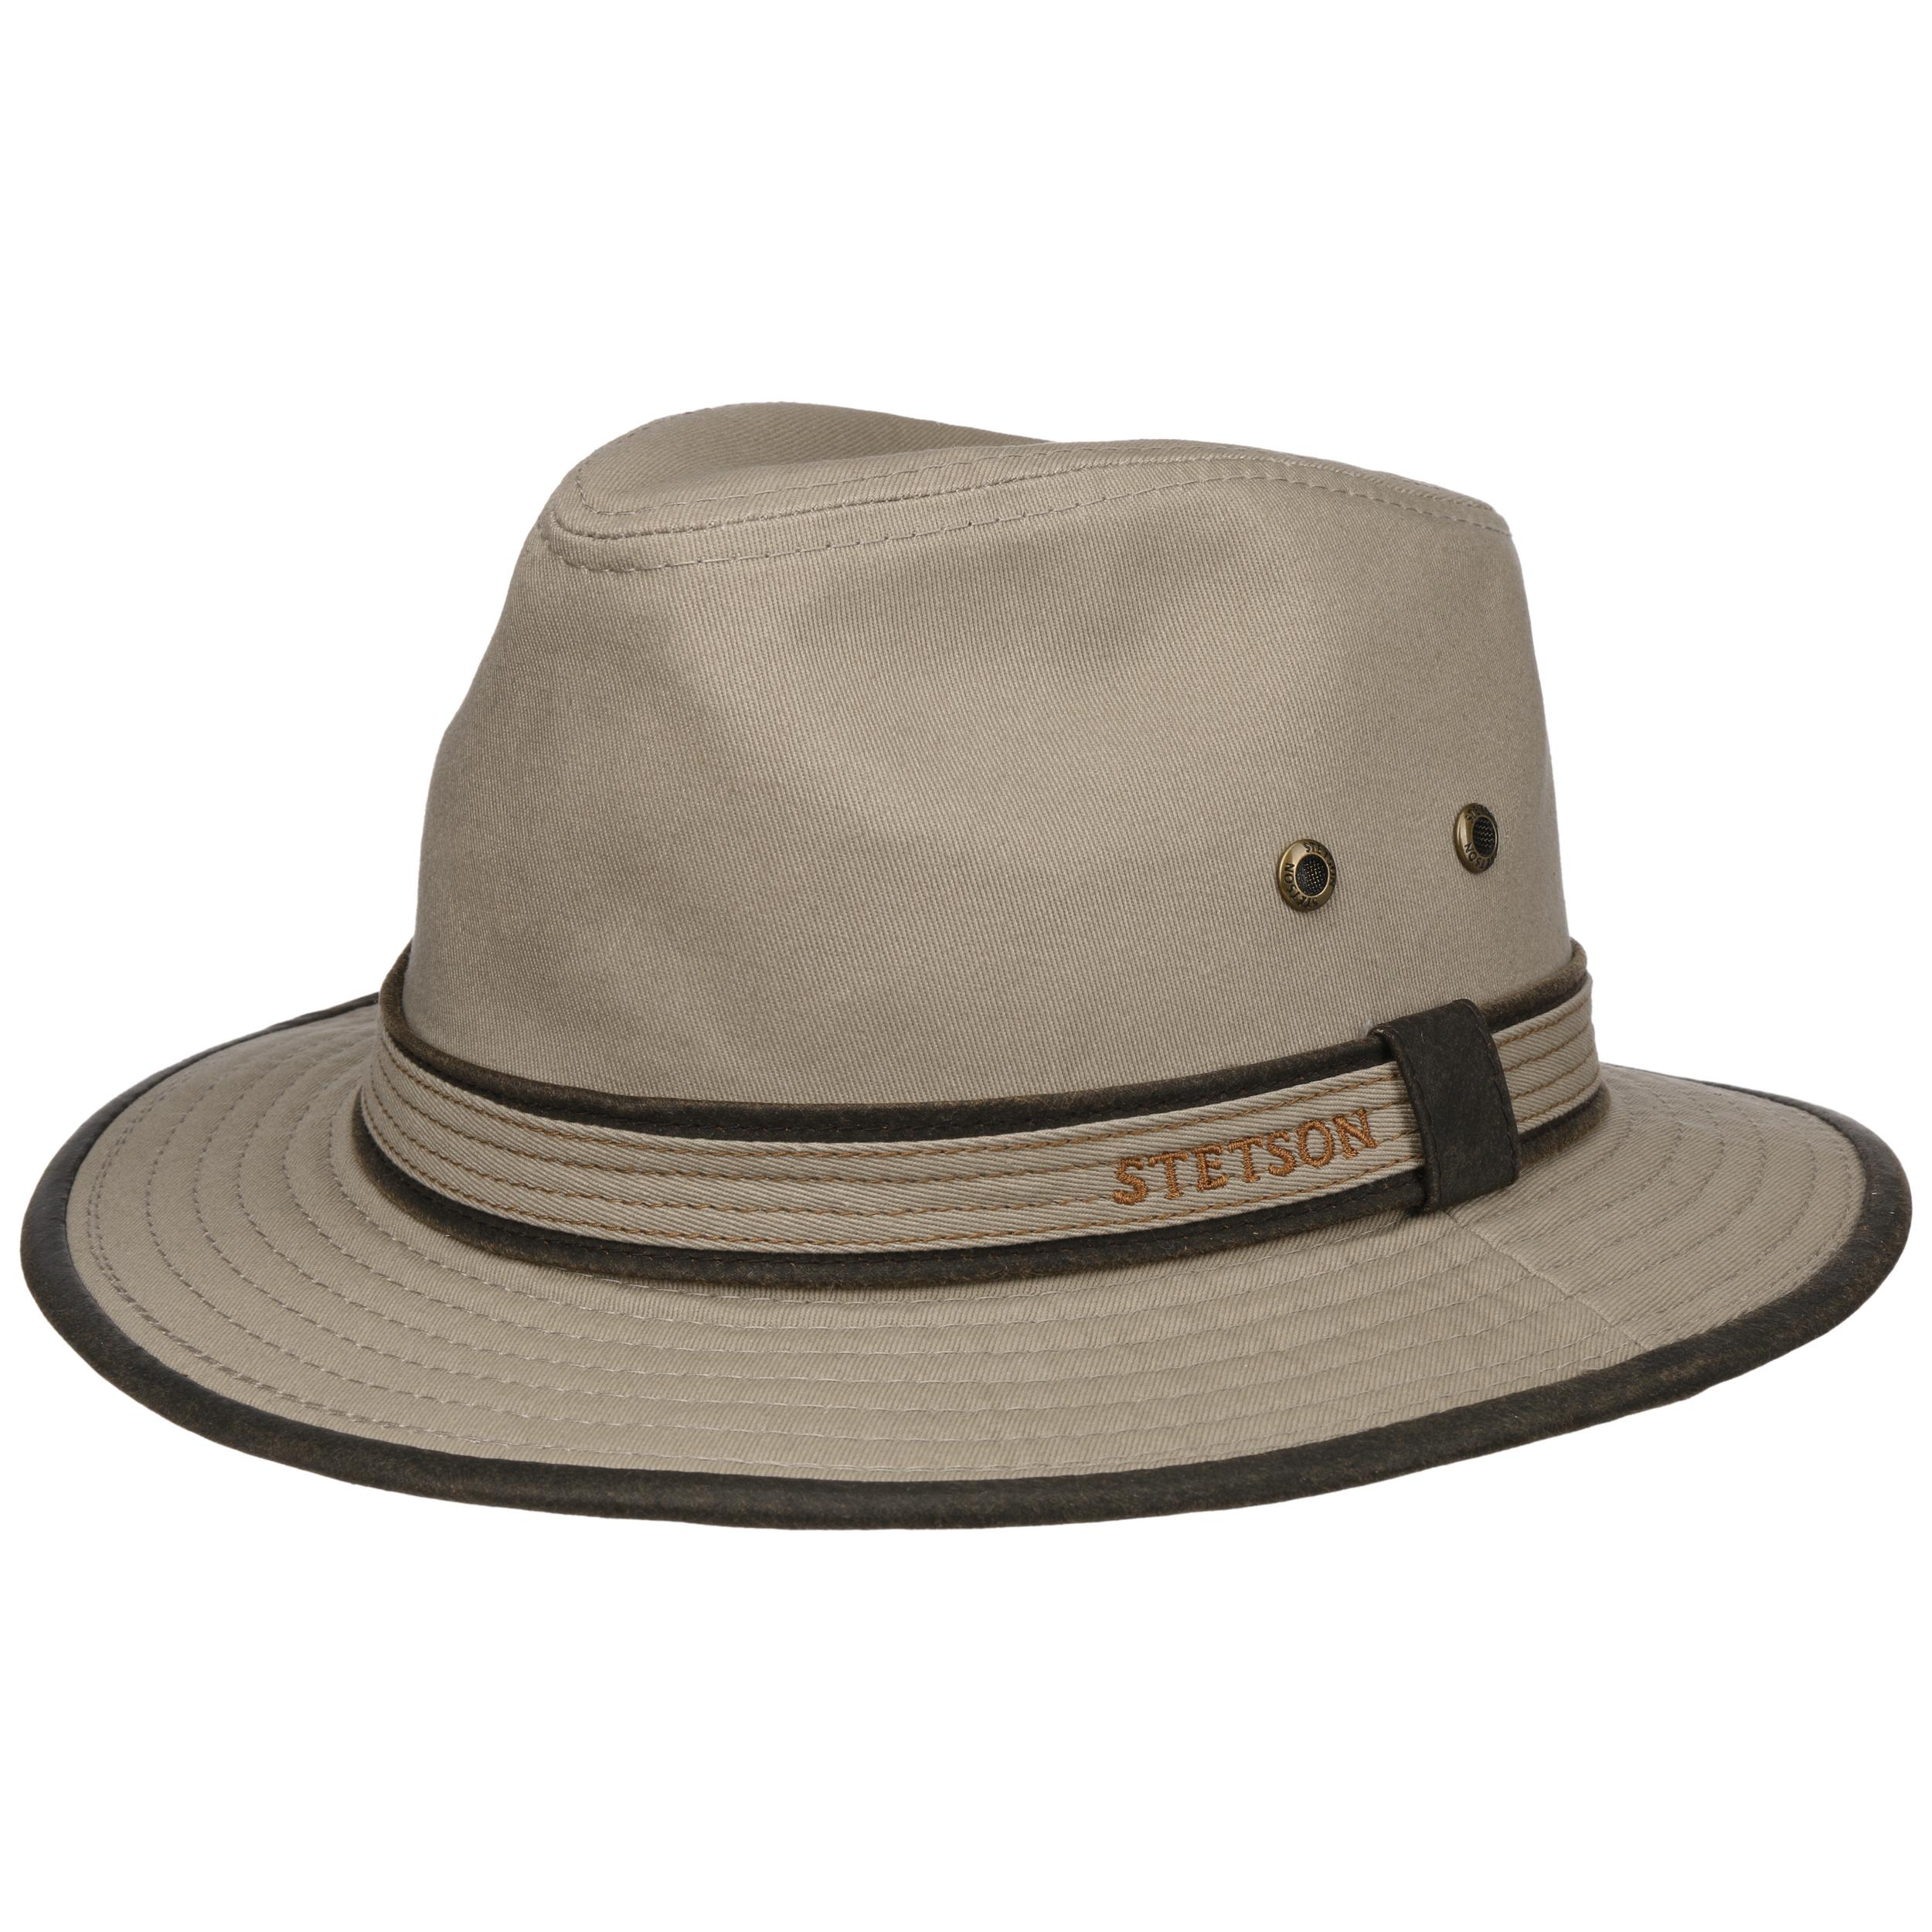 Ava Cotton Protective Sun Hat By Stetson Eur 59 00